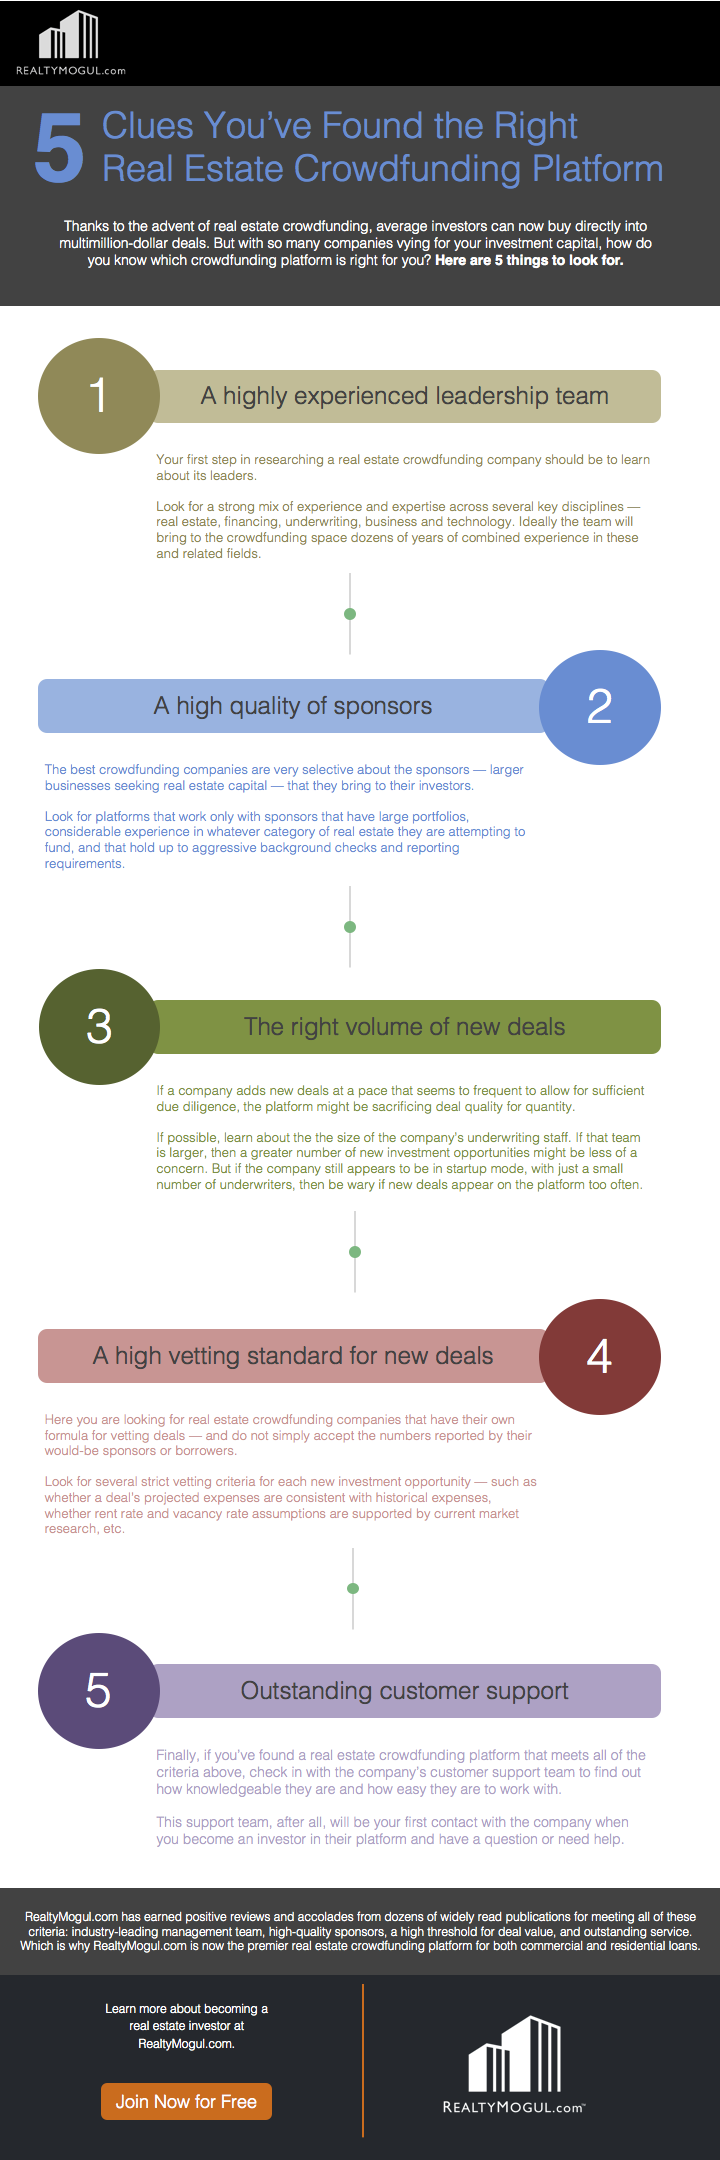 RealtyMogul Infographic -- 5 Clues